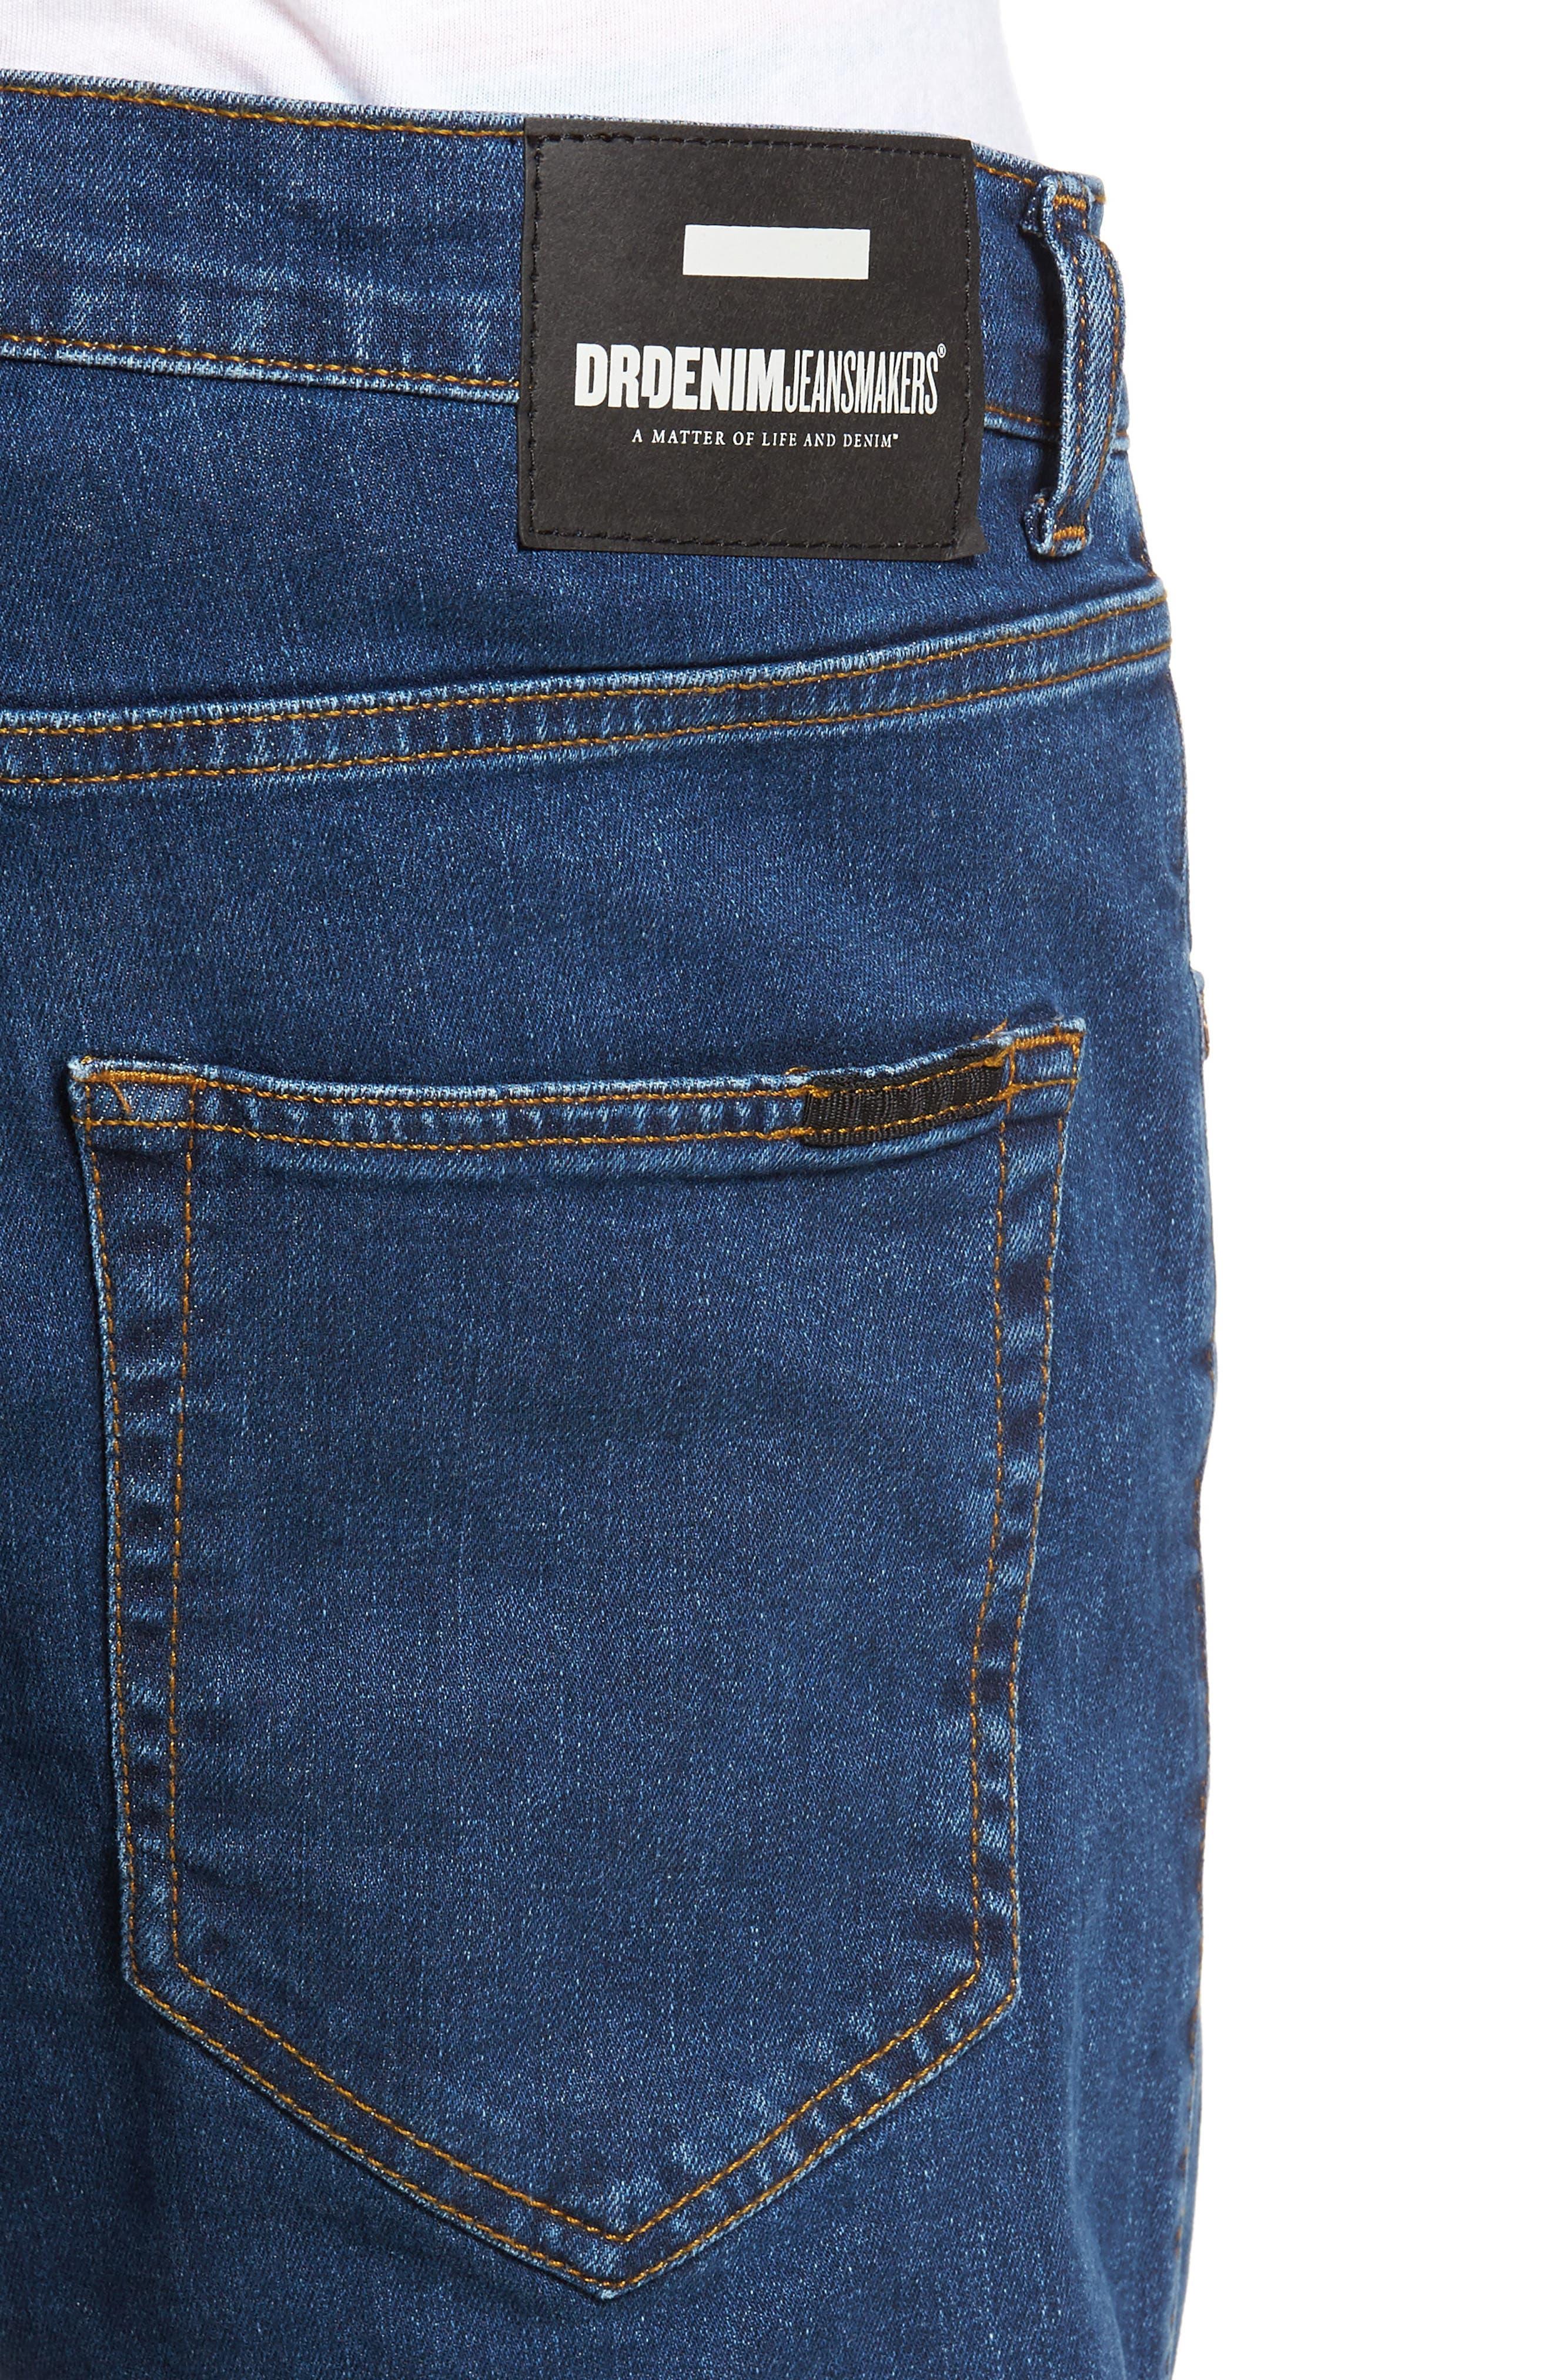 Clark Slim Straight Leg Jeans,                             Alternate thumbnail 4, color,                             Mid Retro